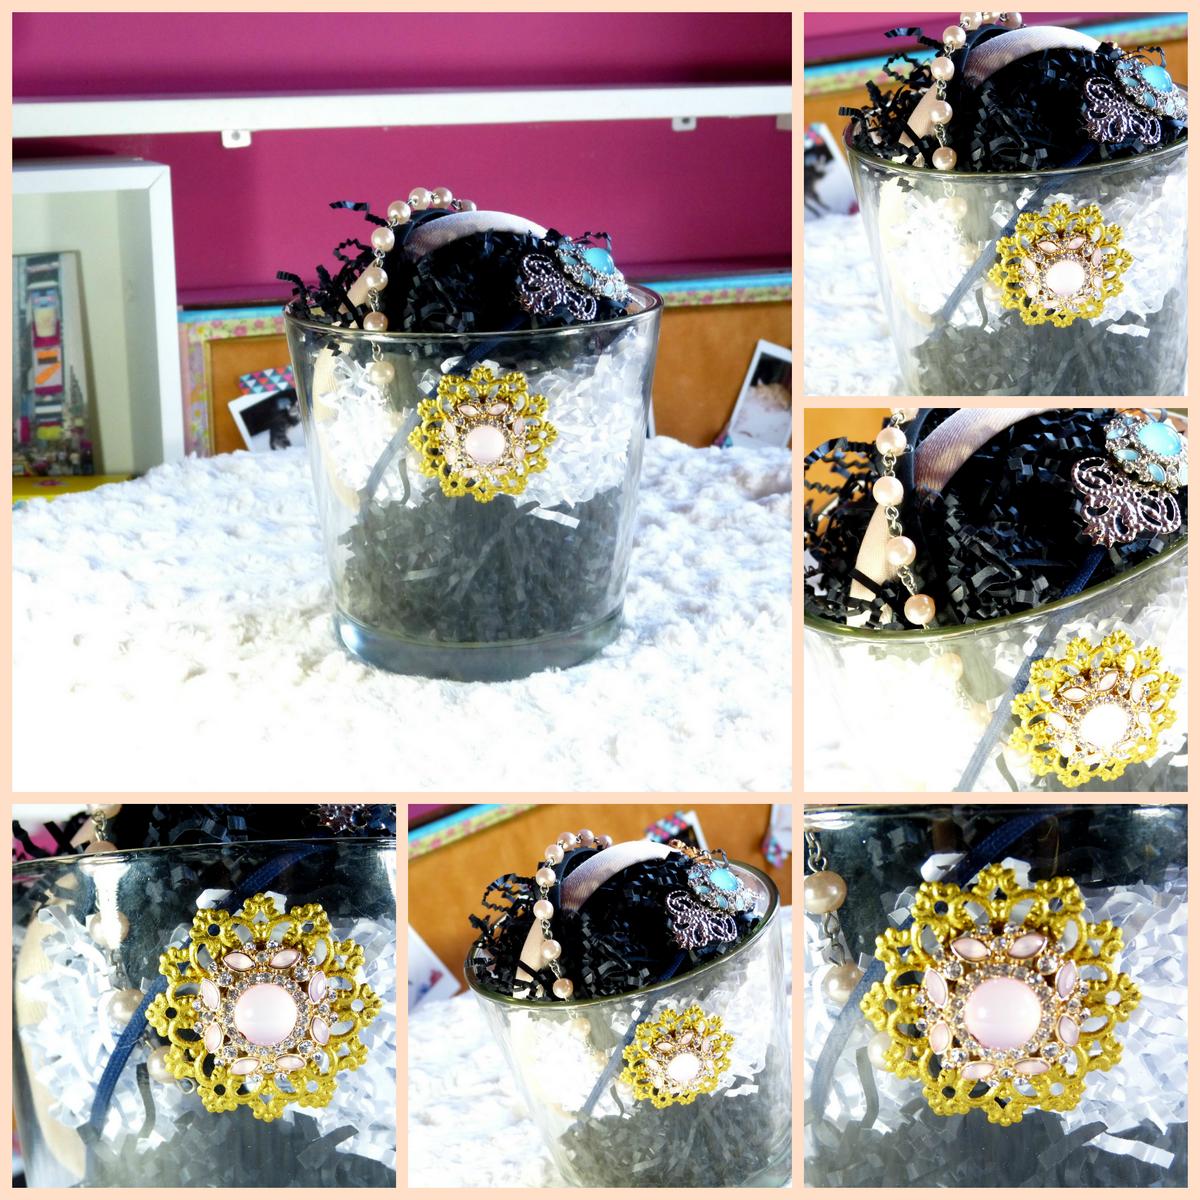 pinkglitter diy customisation d 39 objets en verre pour cr er de jolis rangements pour ses. Black Bedroom Furniture Sets. Home Design Ideas